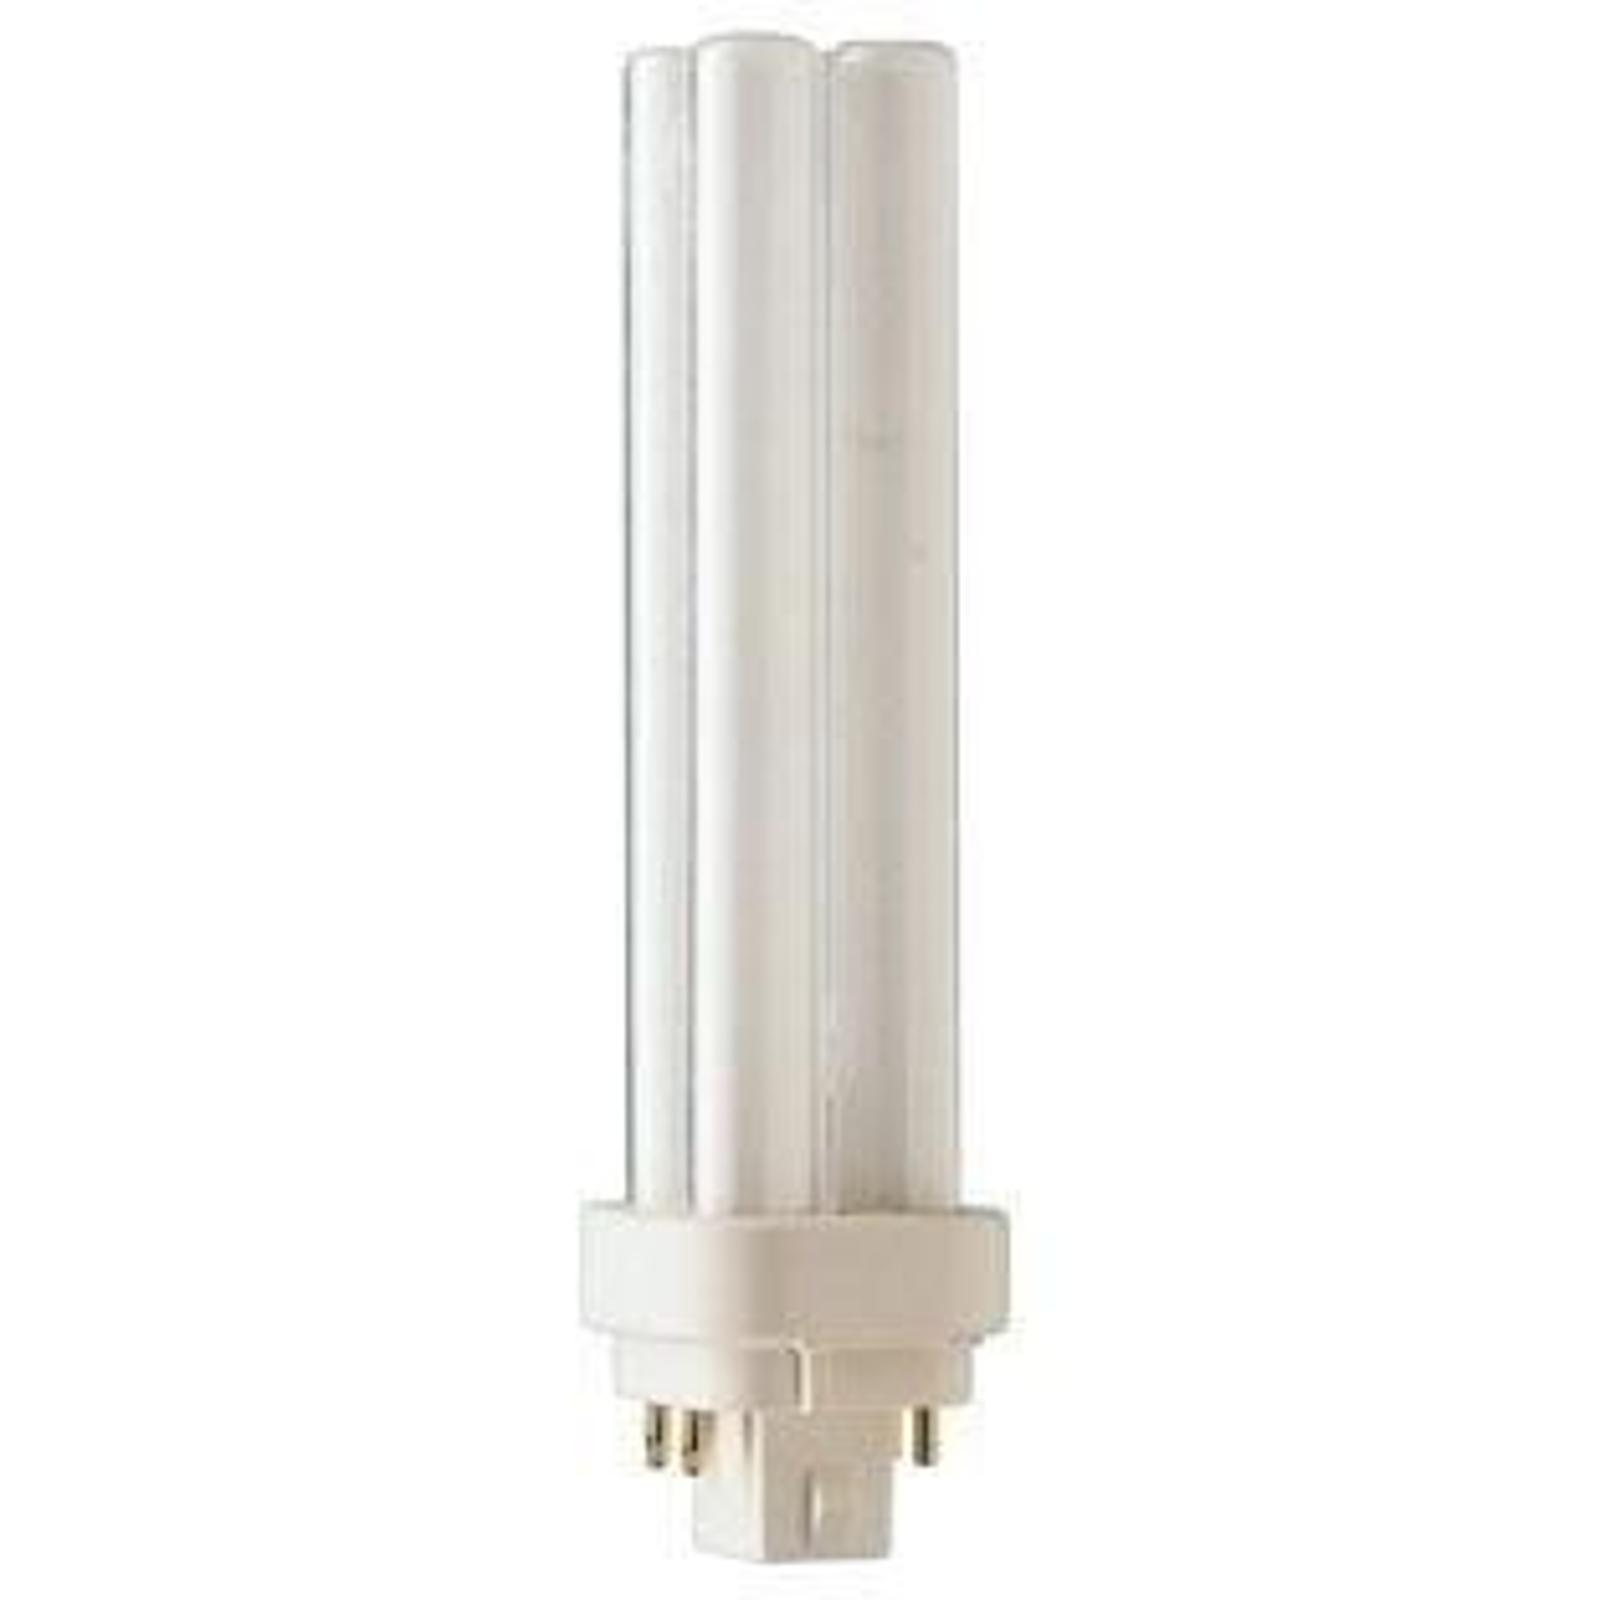 G24q 18W 840 Kompaktleuchtstofflampe DULUX D/E